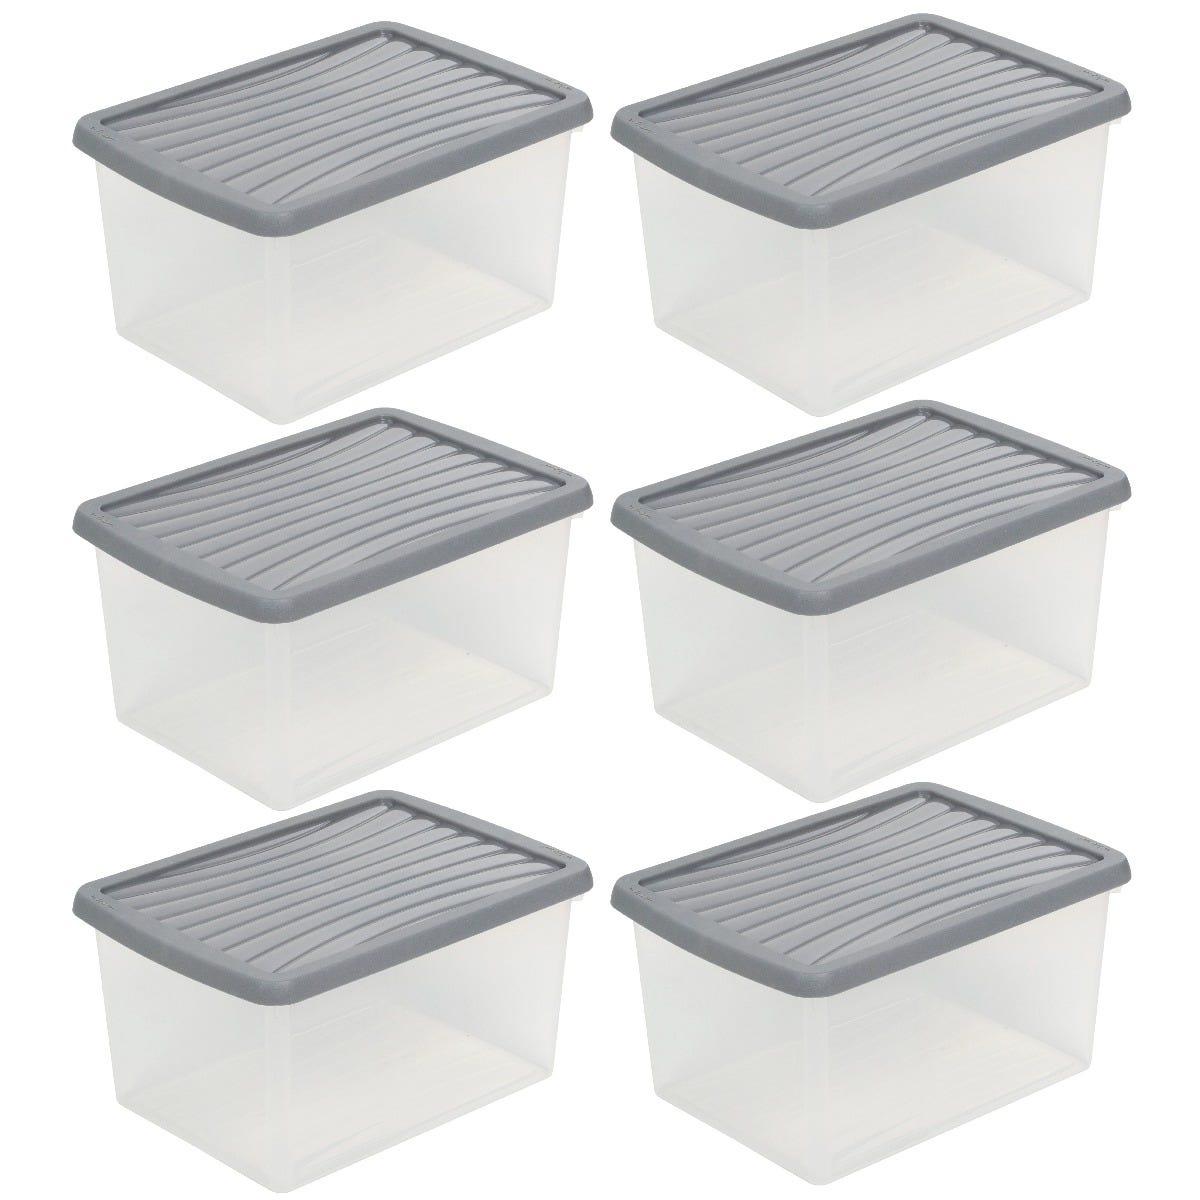 Wham Grey Storage Box & Lid 16L - Set of 6